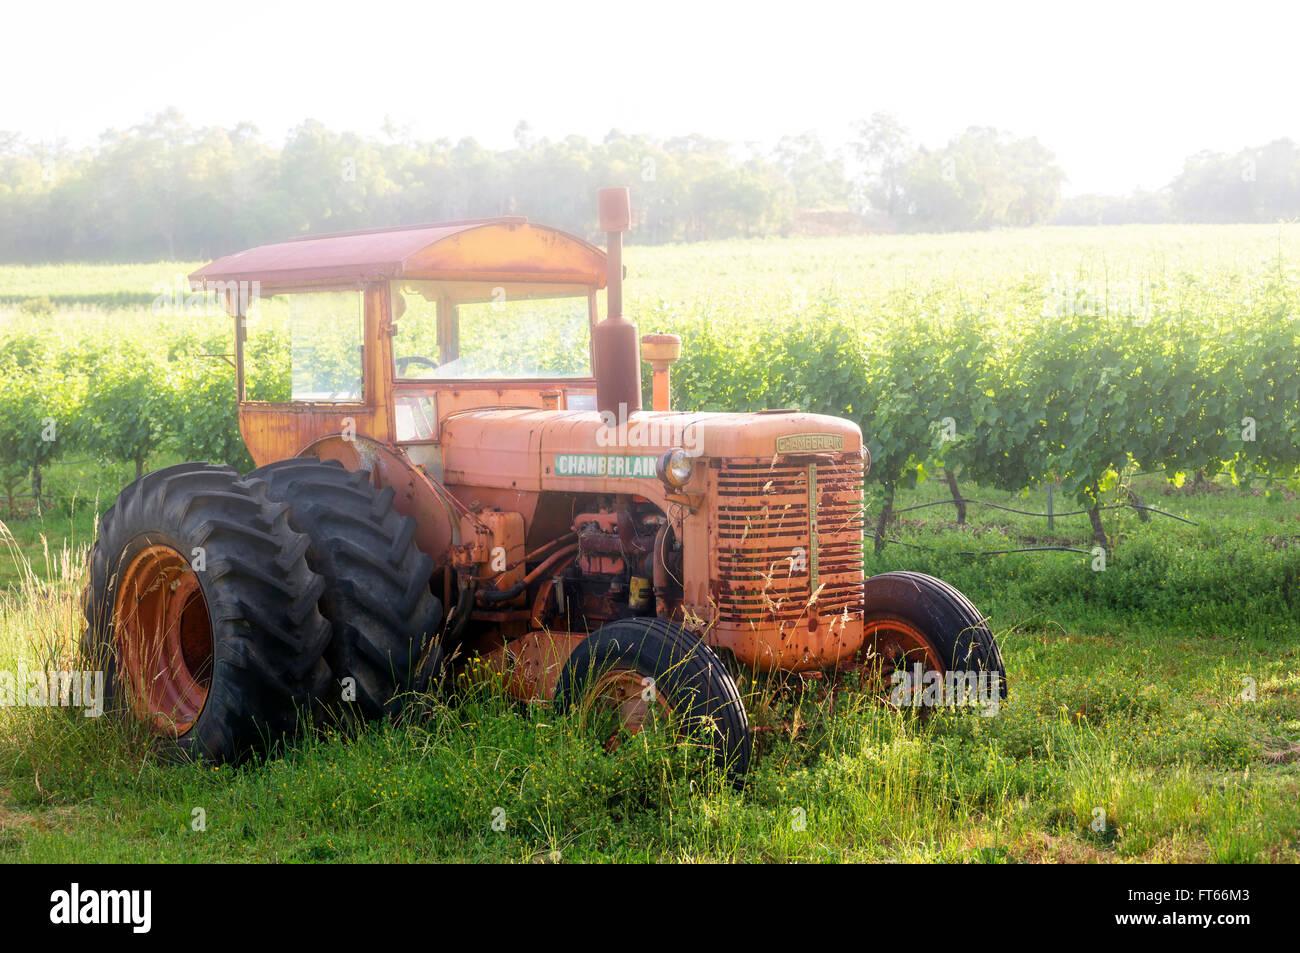 Tractor Broke Down : Tractor old broken down alongside vines stock